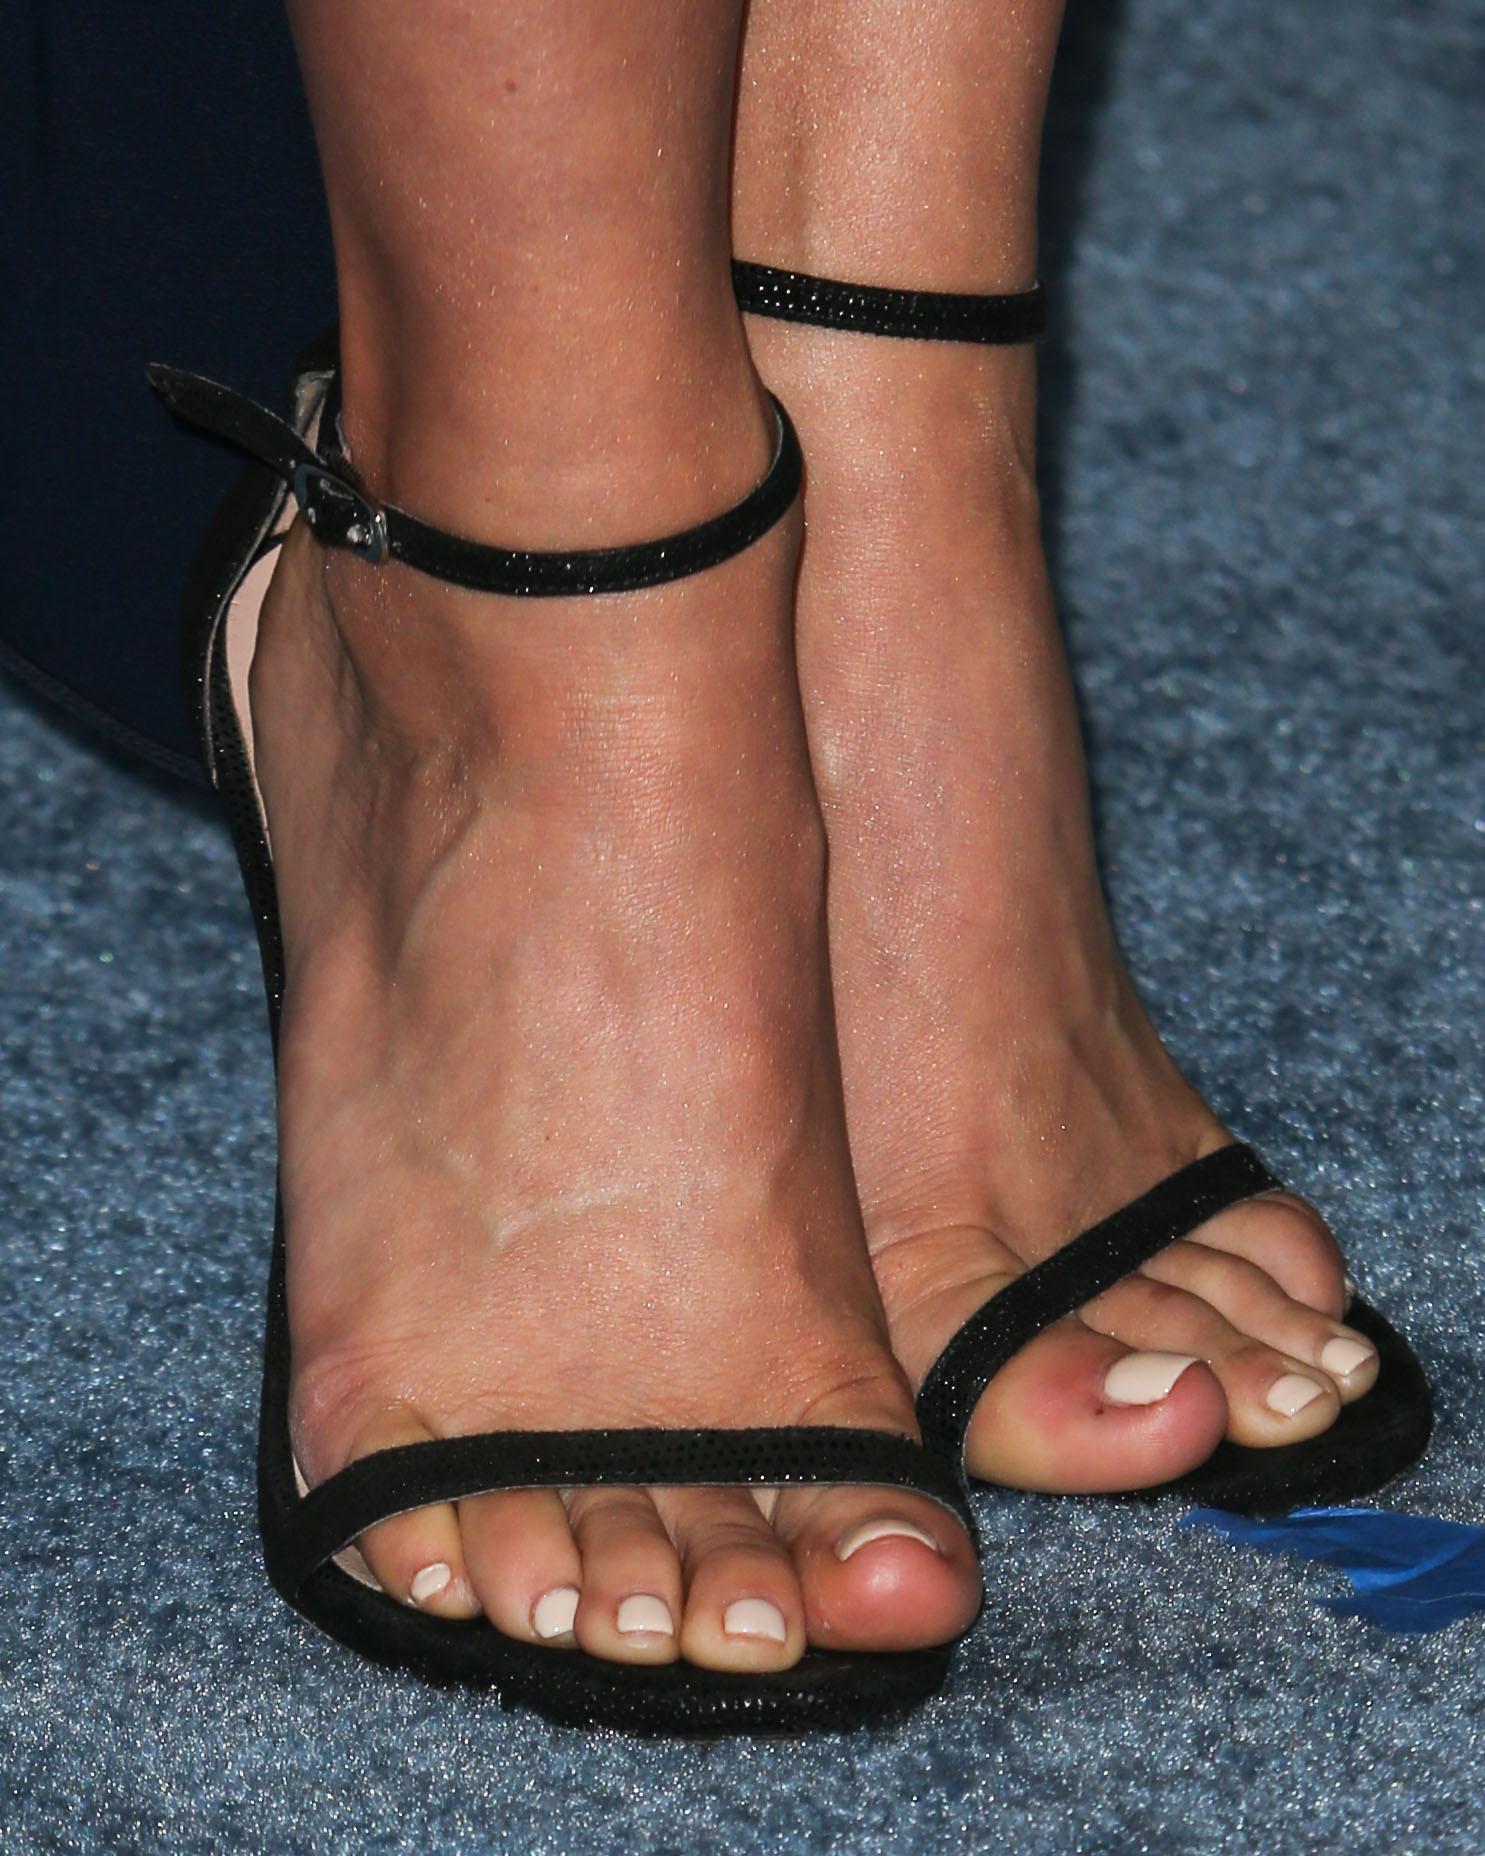 Julianne Hough Feet On Pinterest